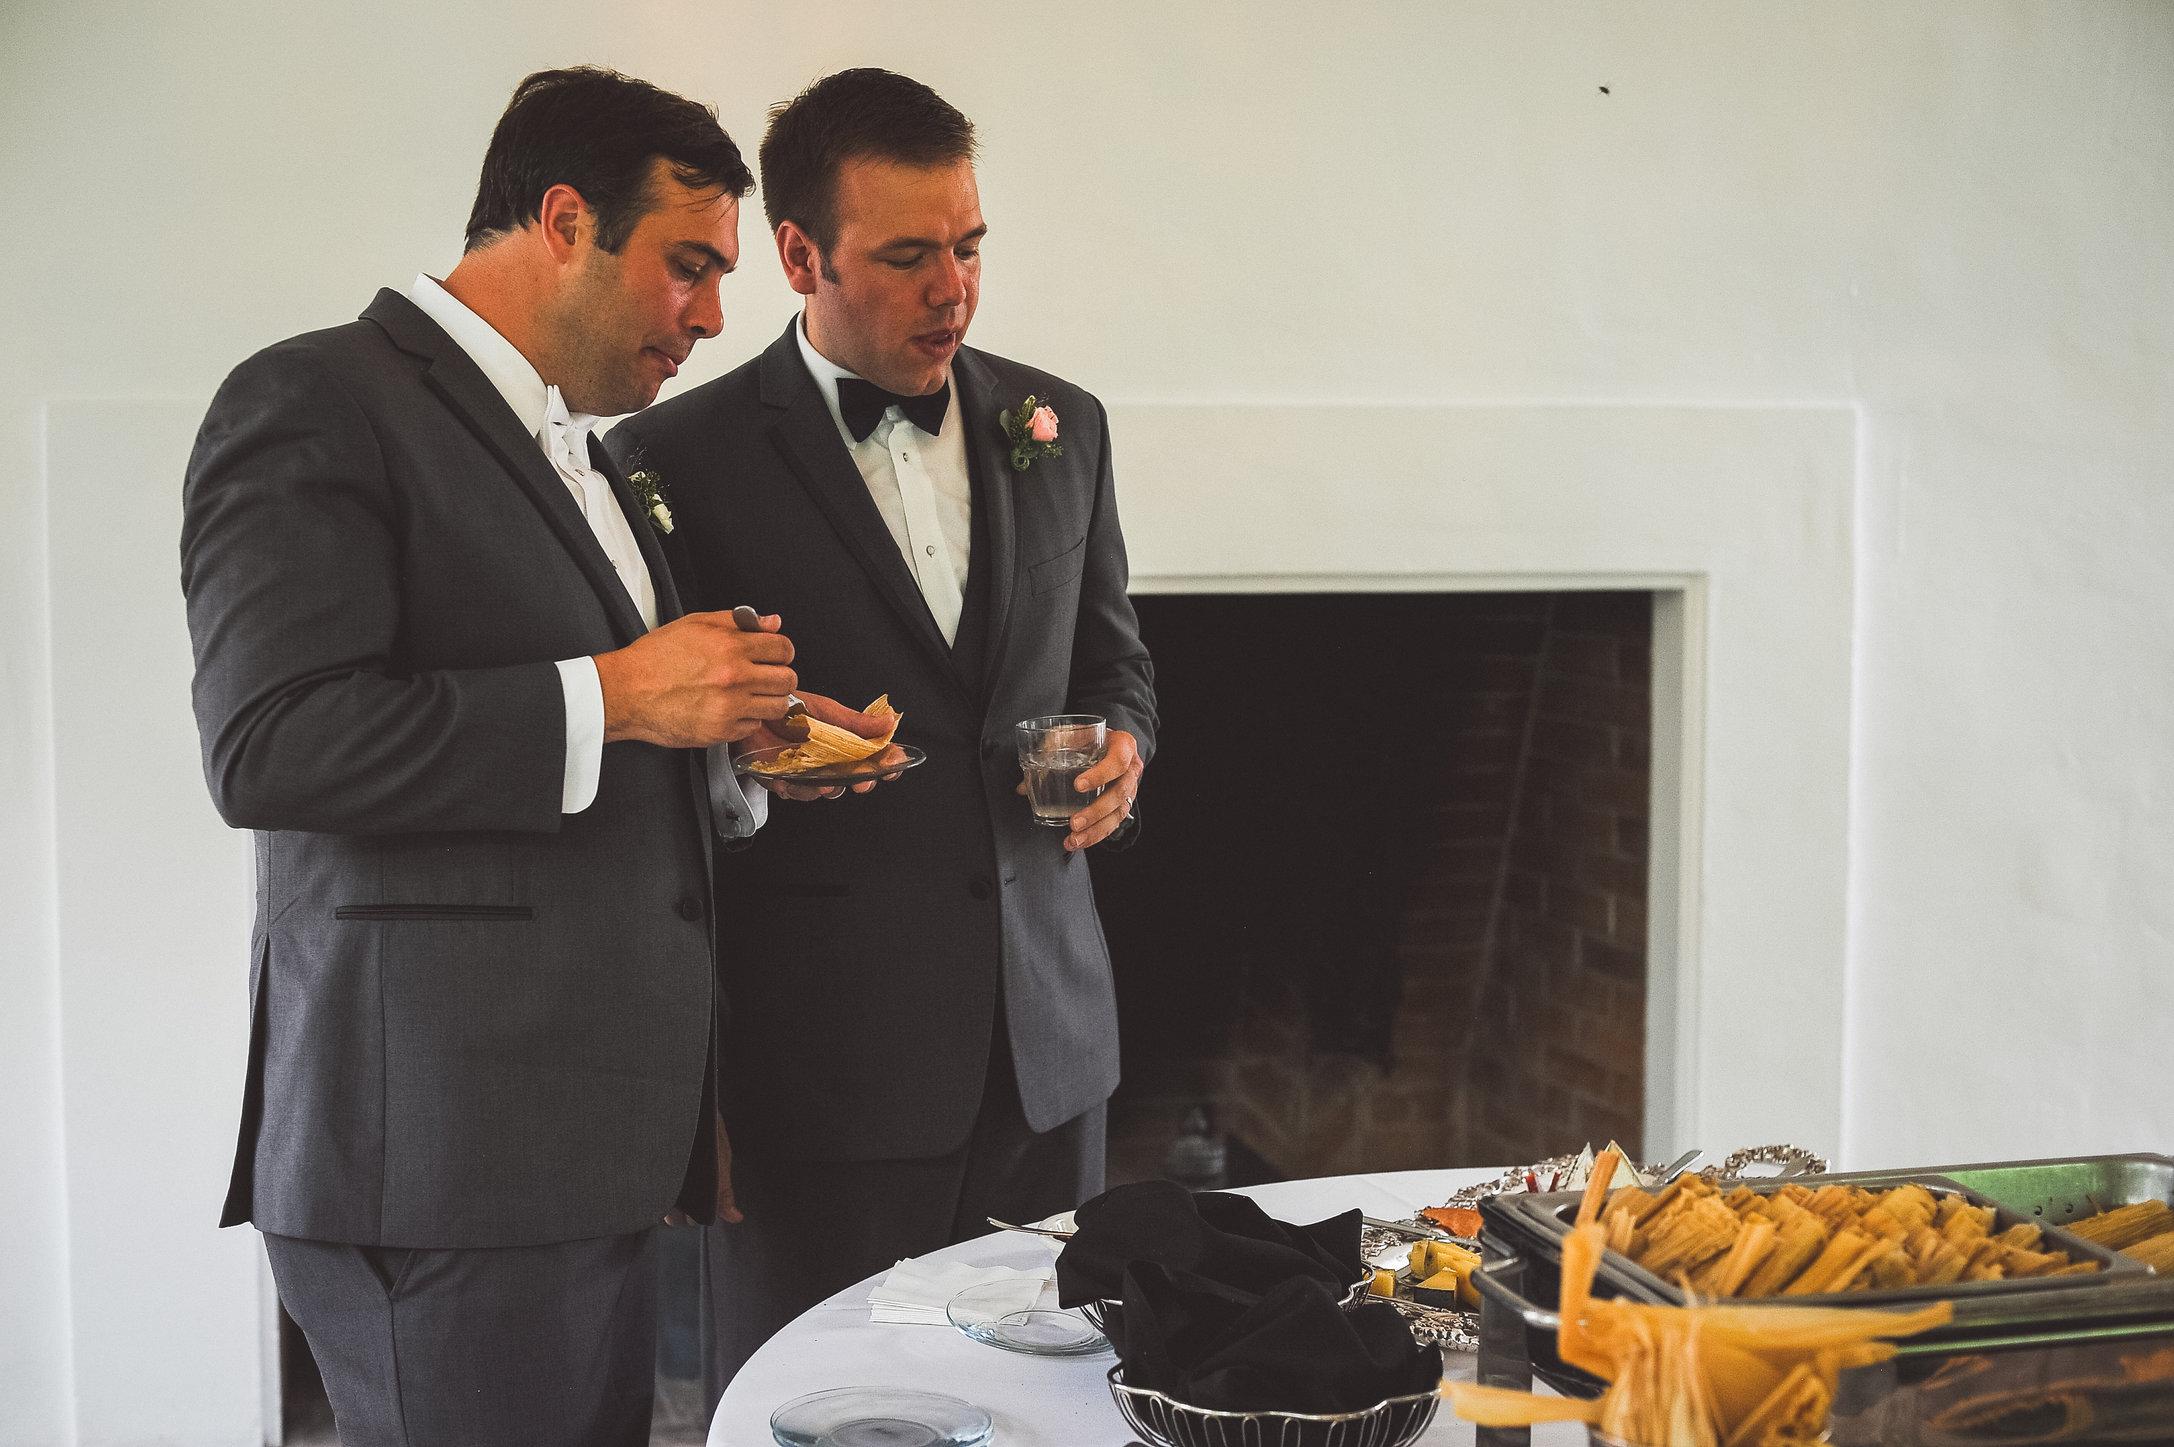 SandC-wedding-418.jpg